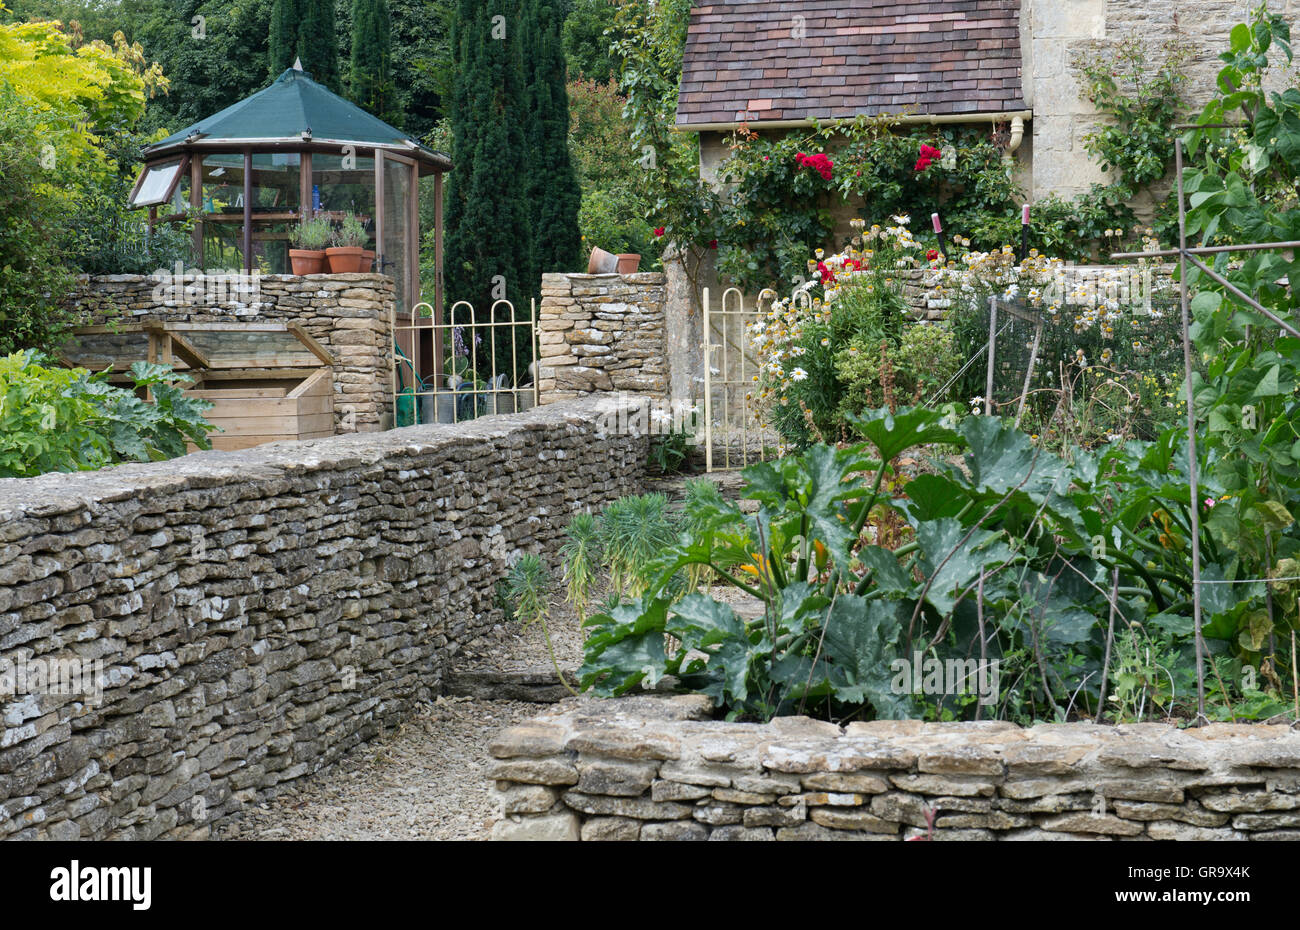 Cotswold kitchen garden. Cotsowlds, England - Stock Image